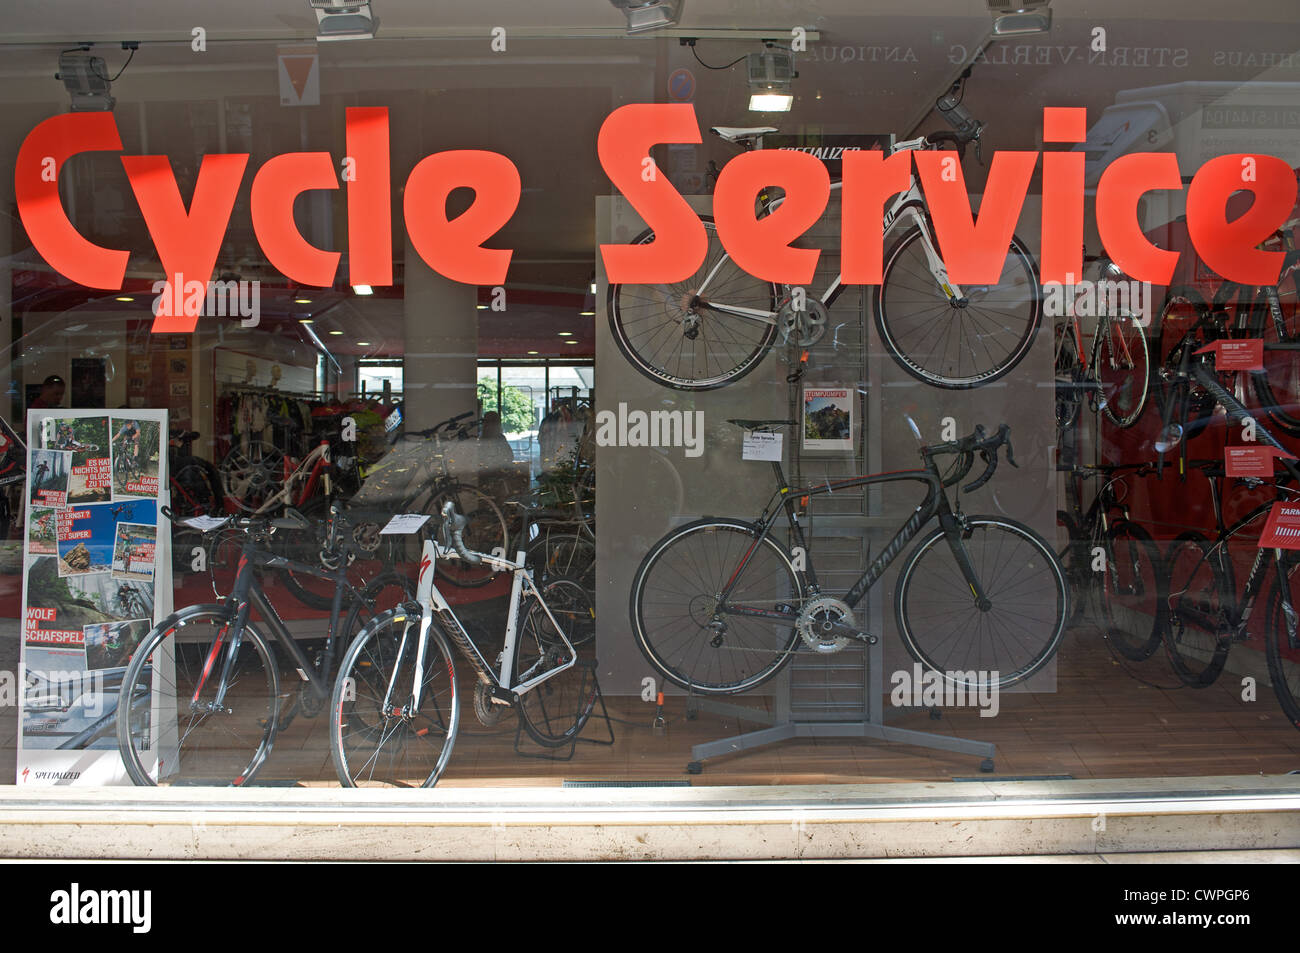 Bicycle shop - Stock Image